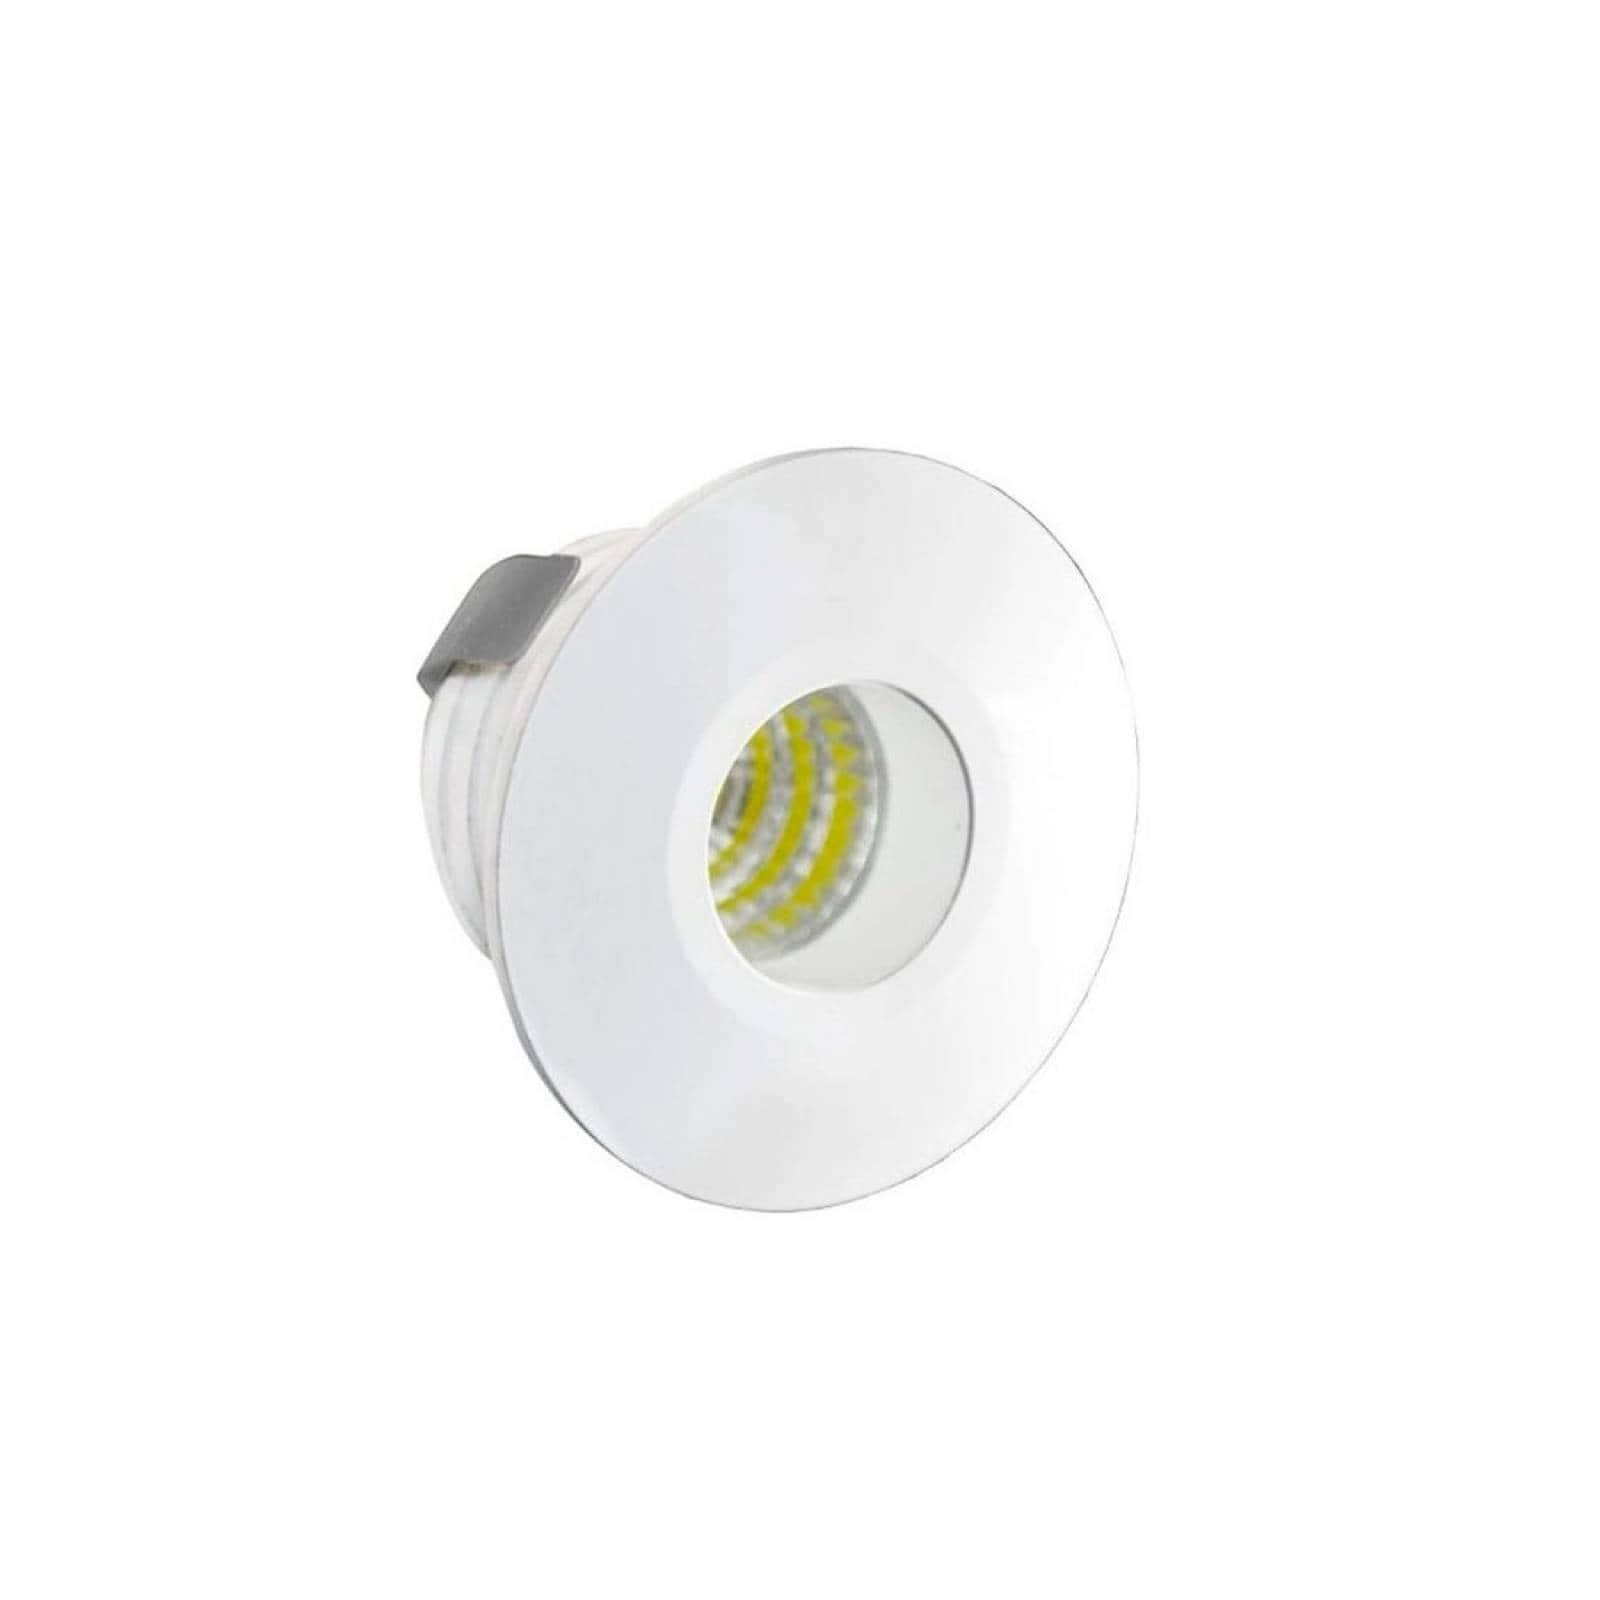 Empotrado Led Mini Circular Blanco Ad-5482 3W Adir